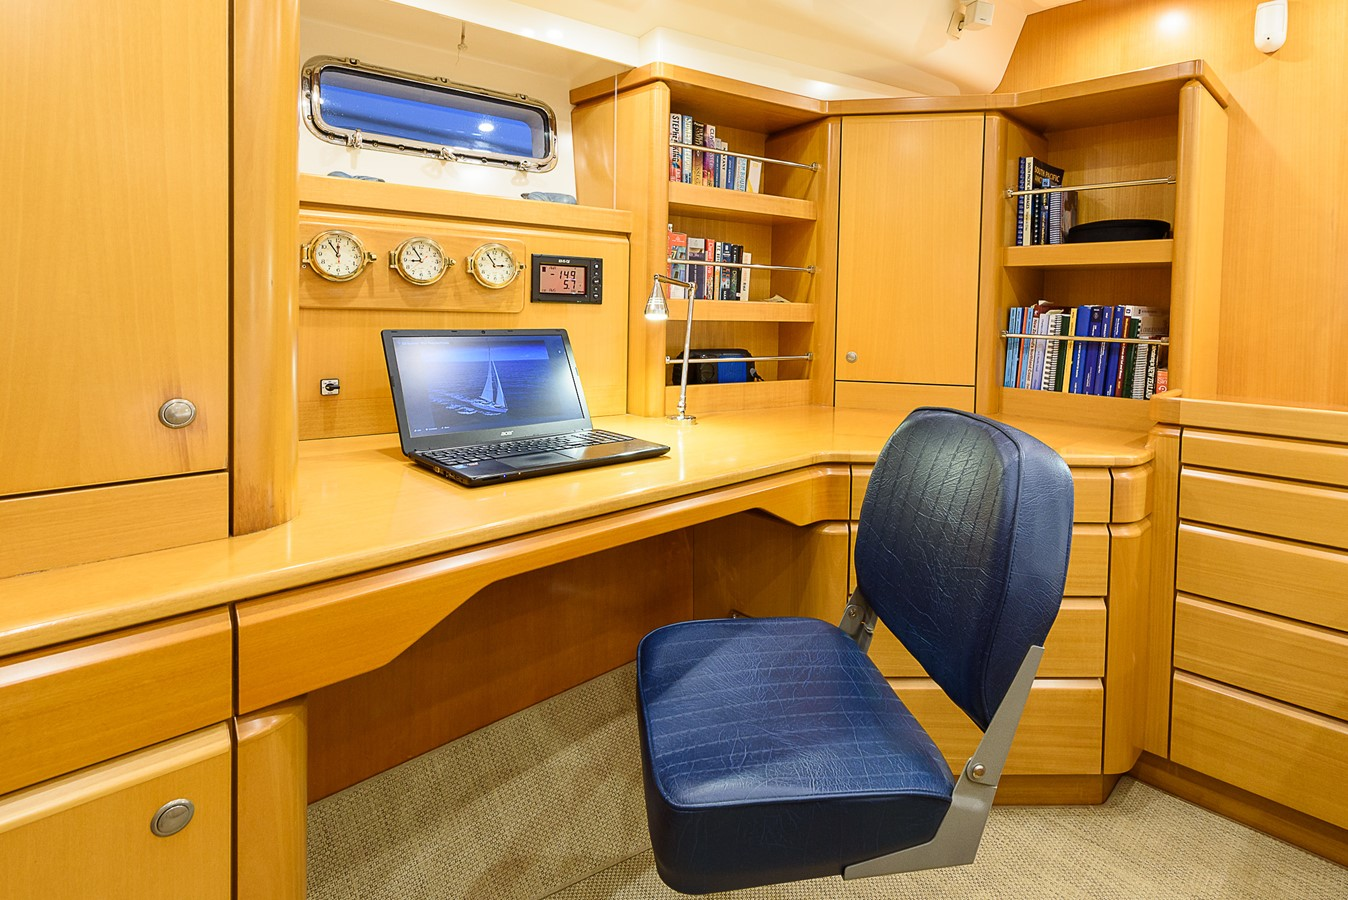 Office Space in Owner's Cabin 2000 KELLY ARCHER Van de Stadt Cruising Sailboat Cruising Sailboat 2481188